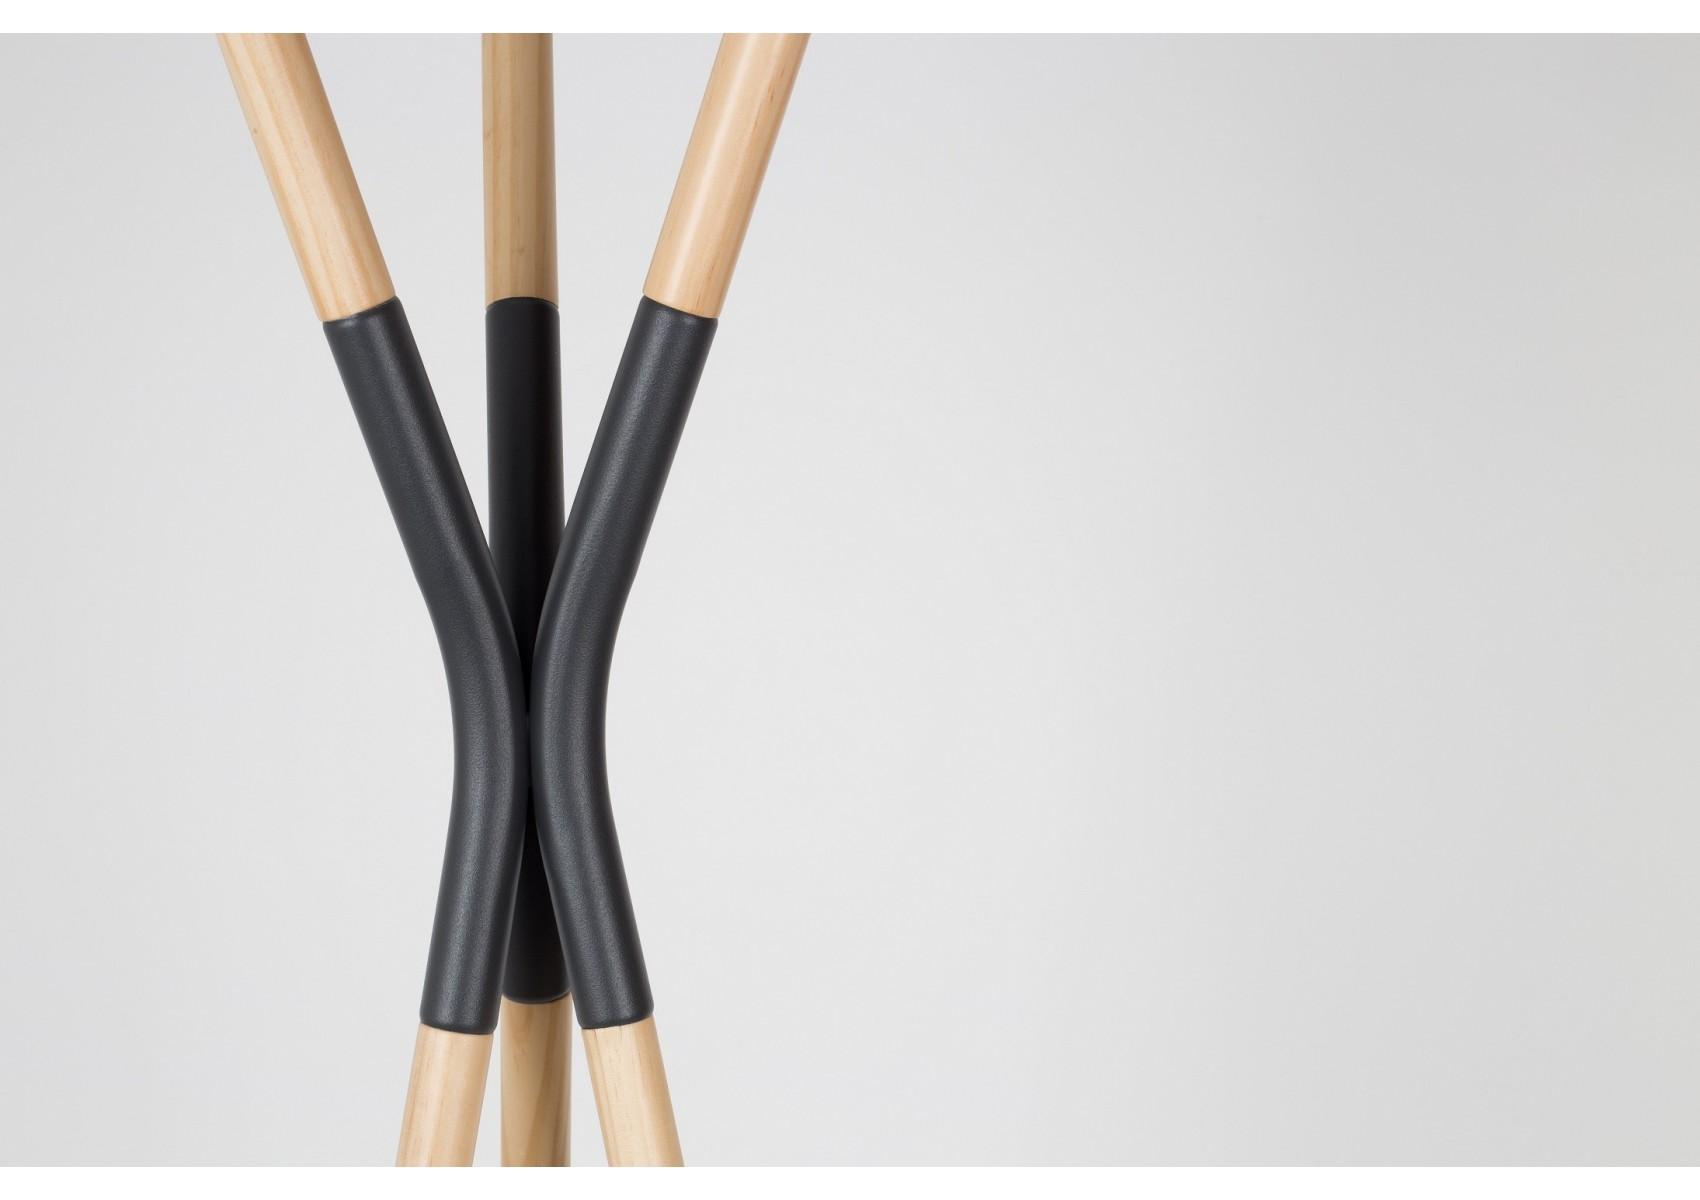 porte manteaux design scandinave pinnacle boite design. Black Bedroom Furniture Sets. Home Design Ideas